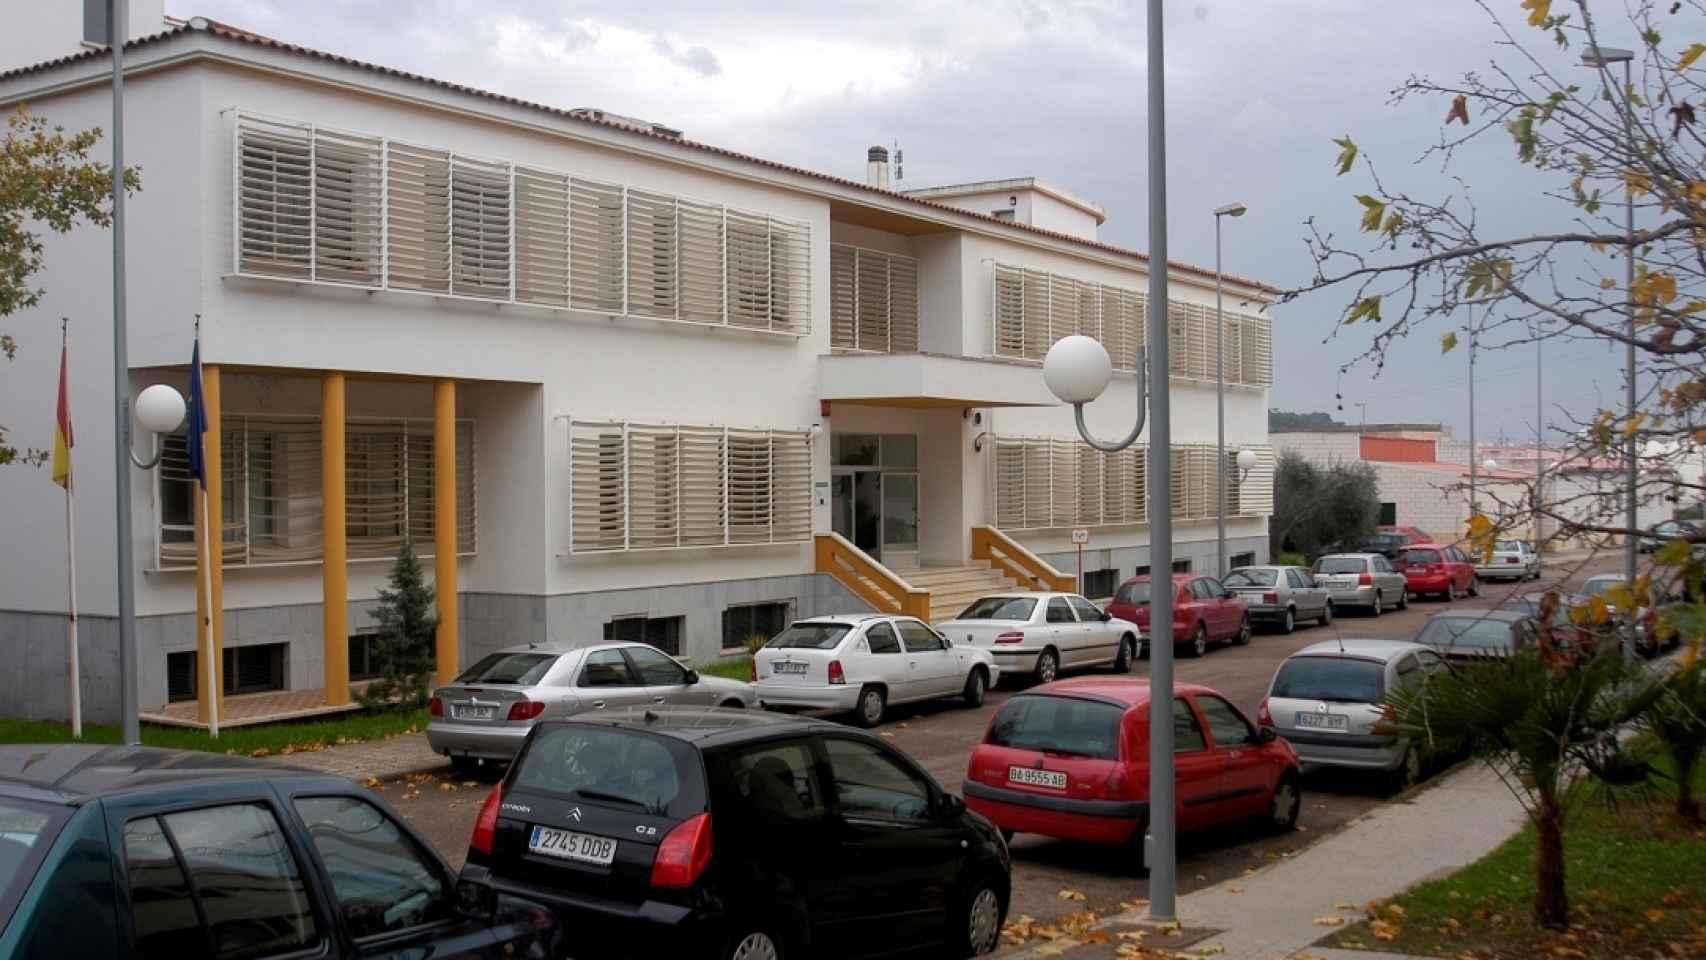 Instituto Tecnológico Agroalimentario de Extremadura